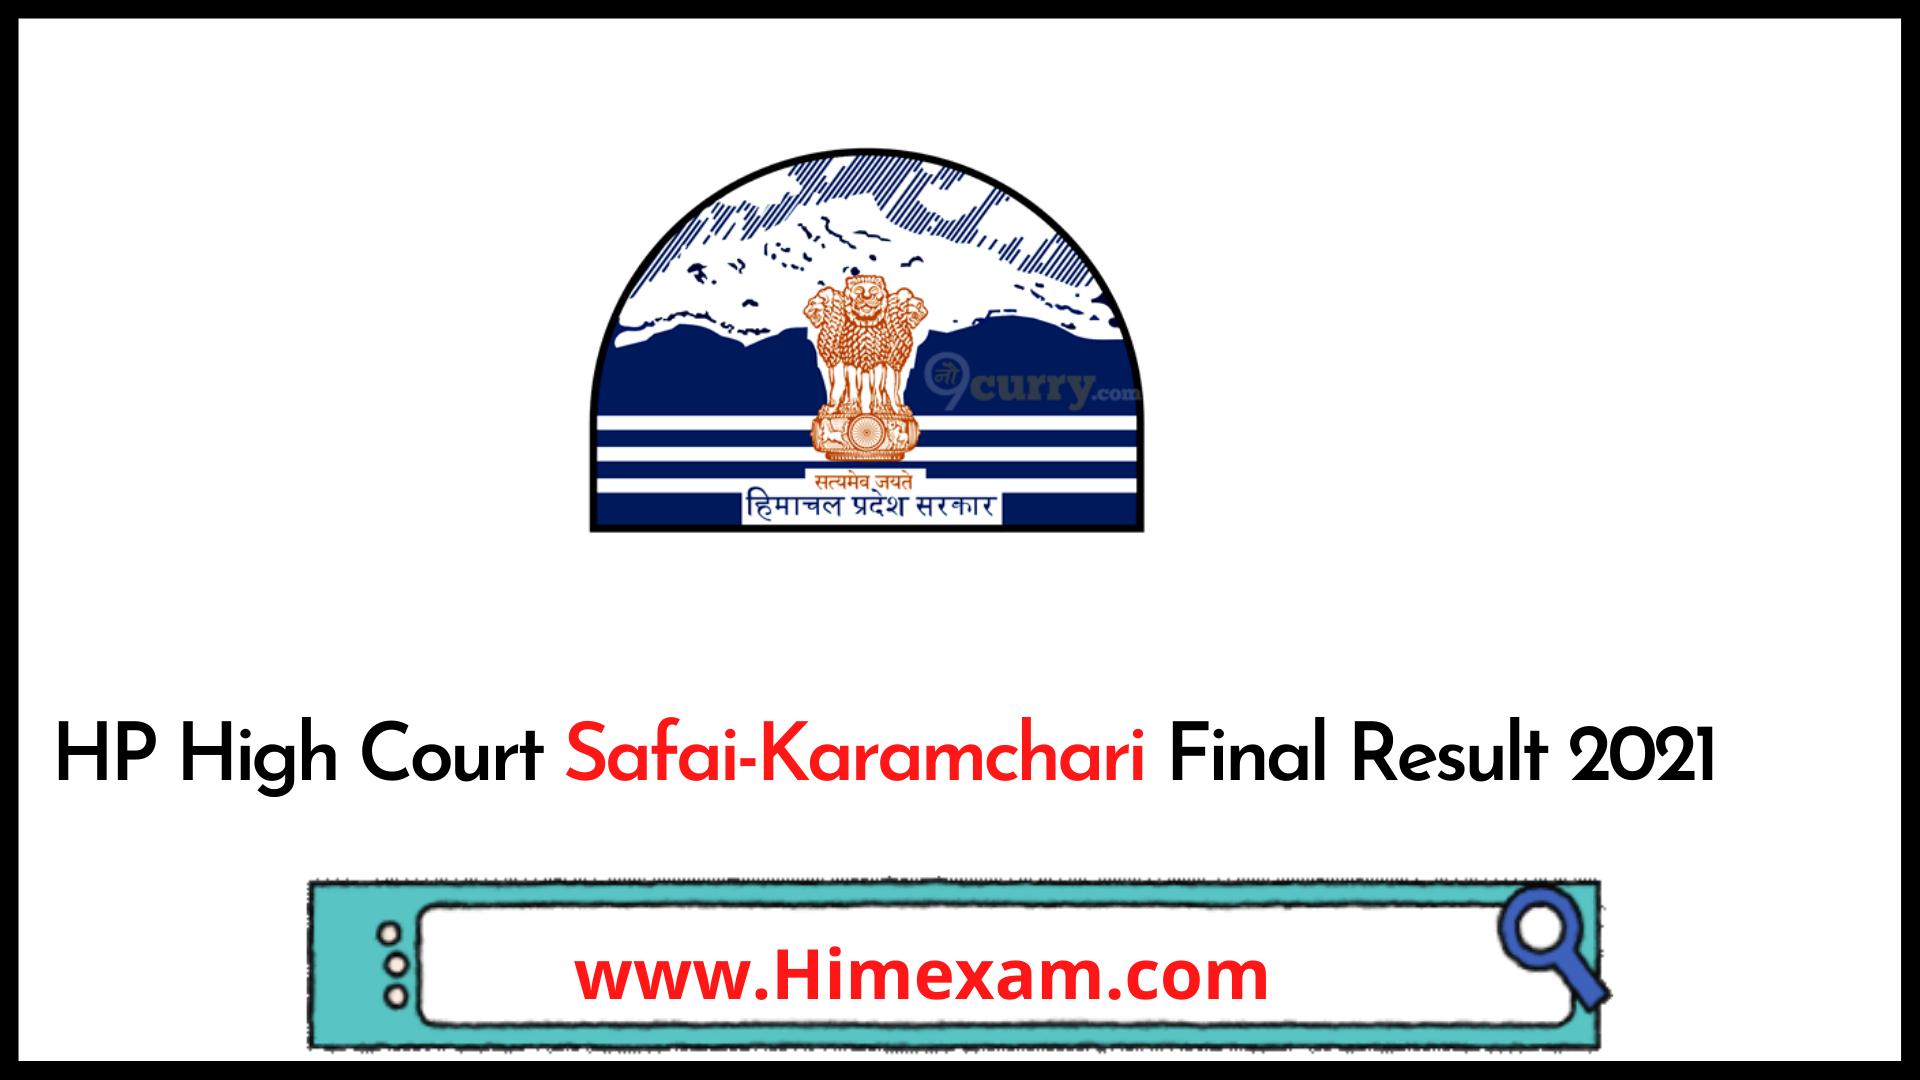 HP High Court Safai-Karamchari Final Result 2021